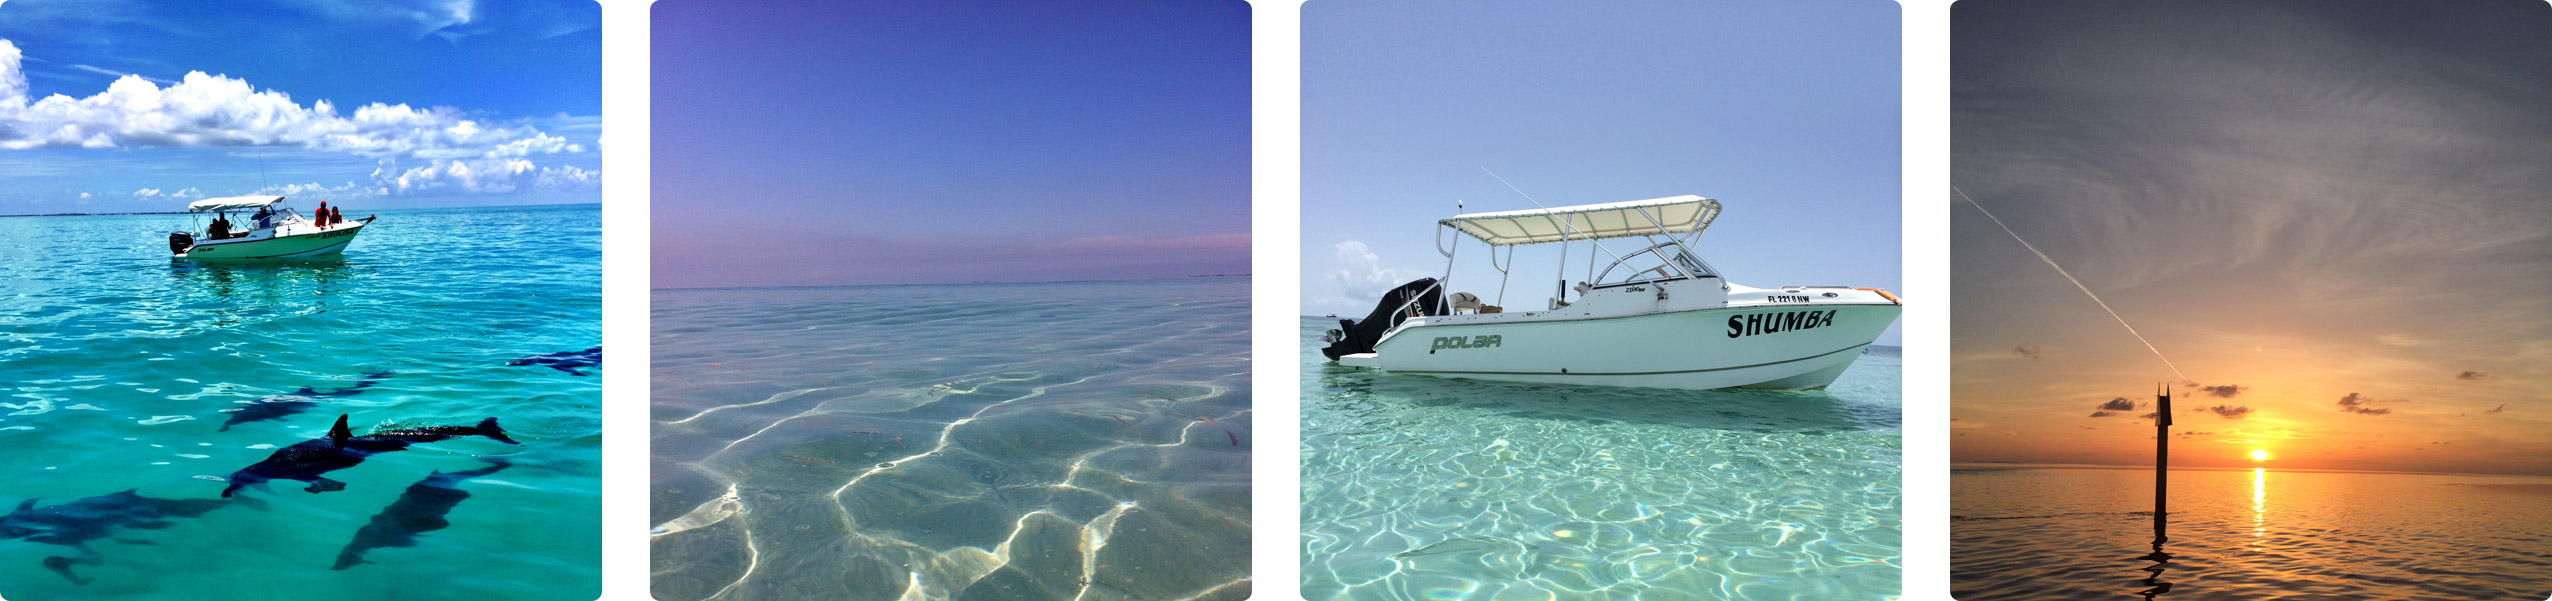 Boating in Key West